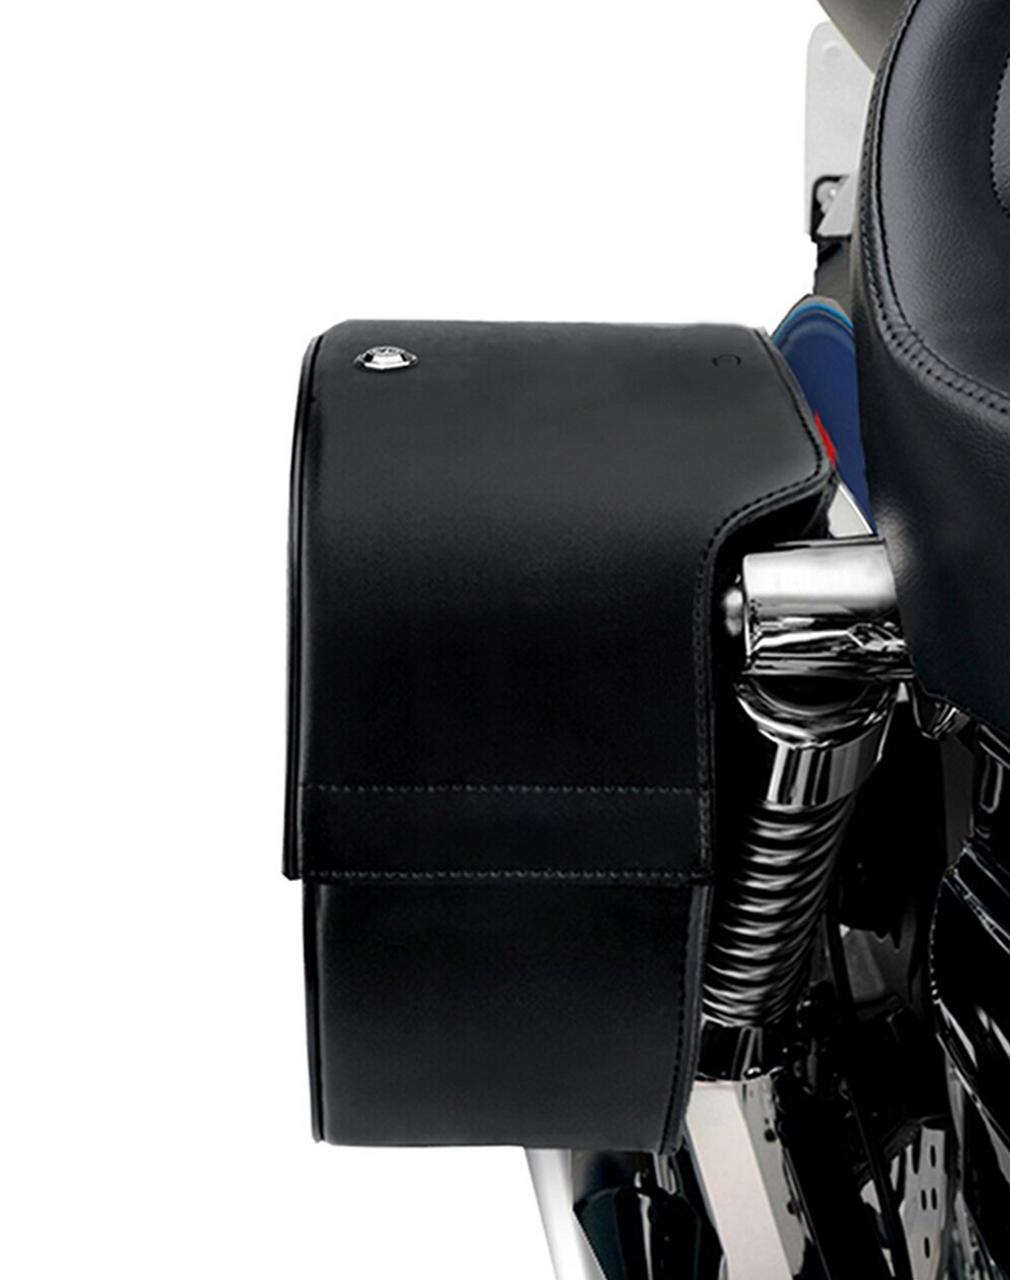 Honda VTX 1800 F Shock Cutout Slanted Studded Large Motorcycle Saddlebags Shock Cutout View